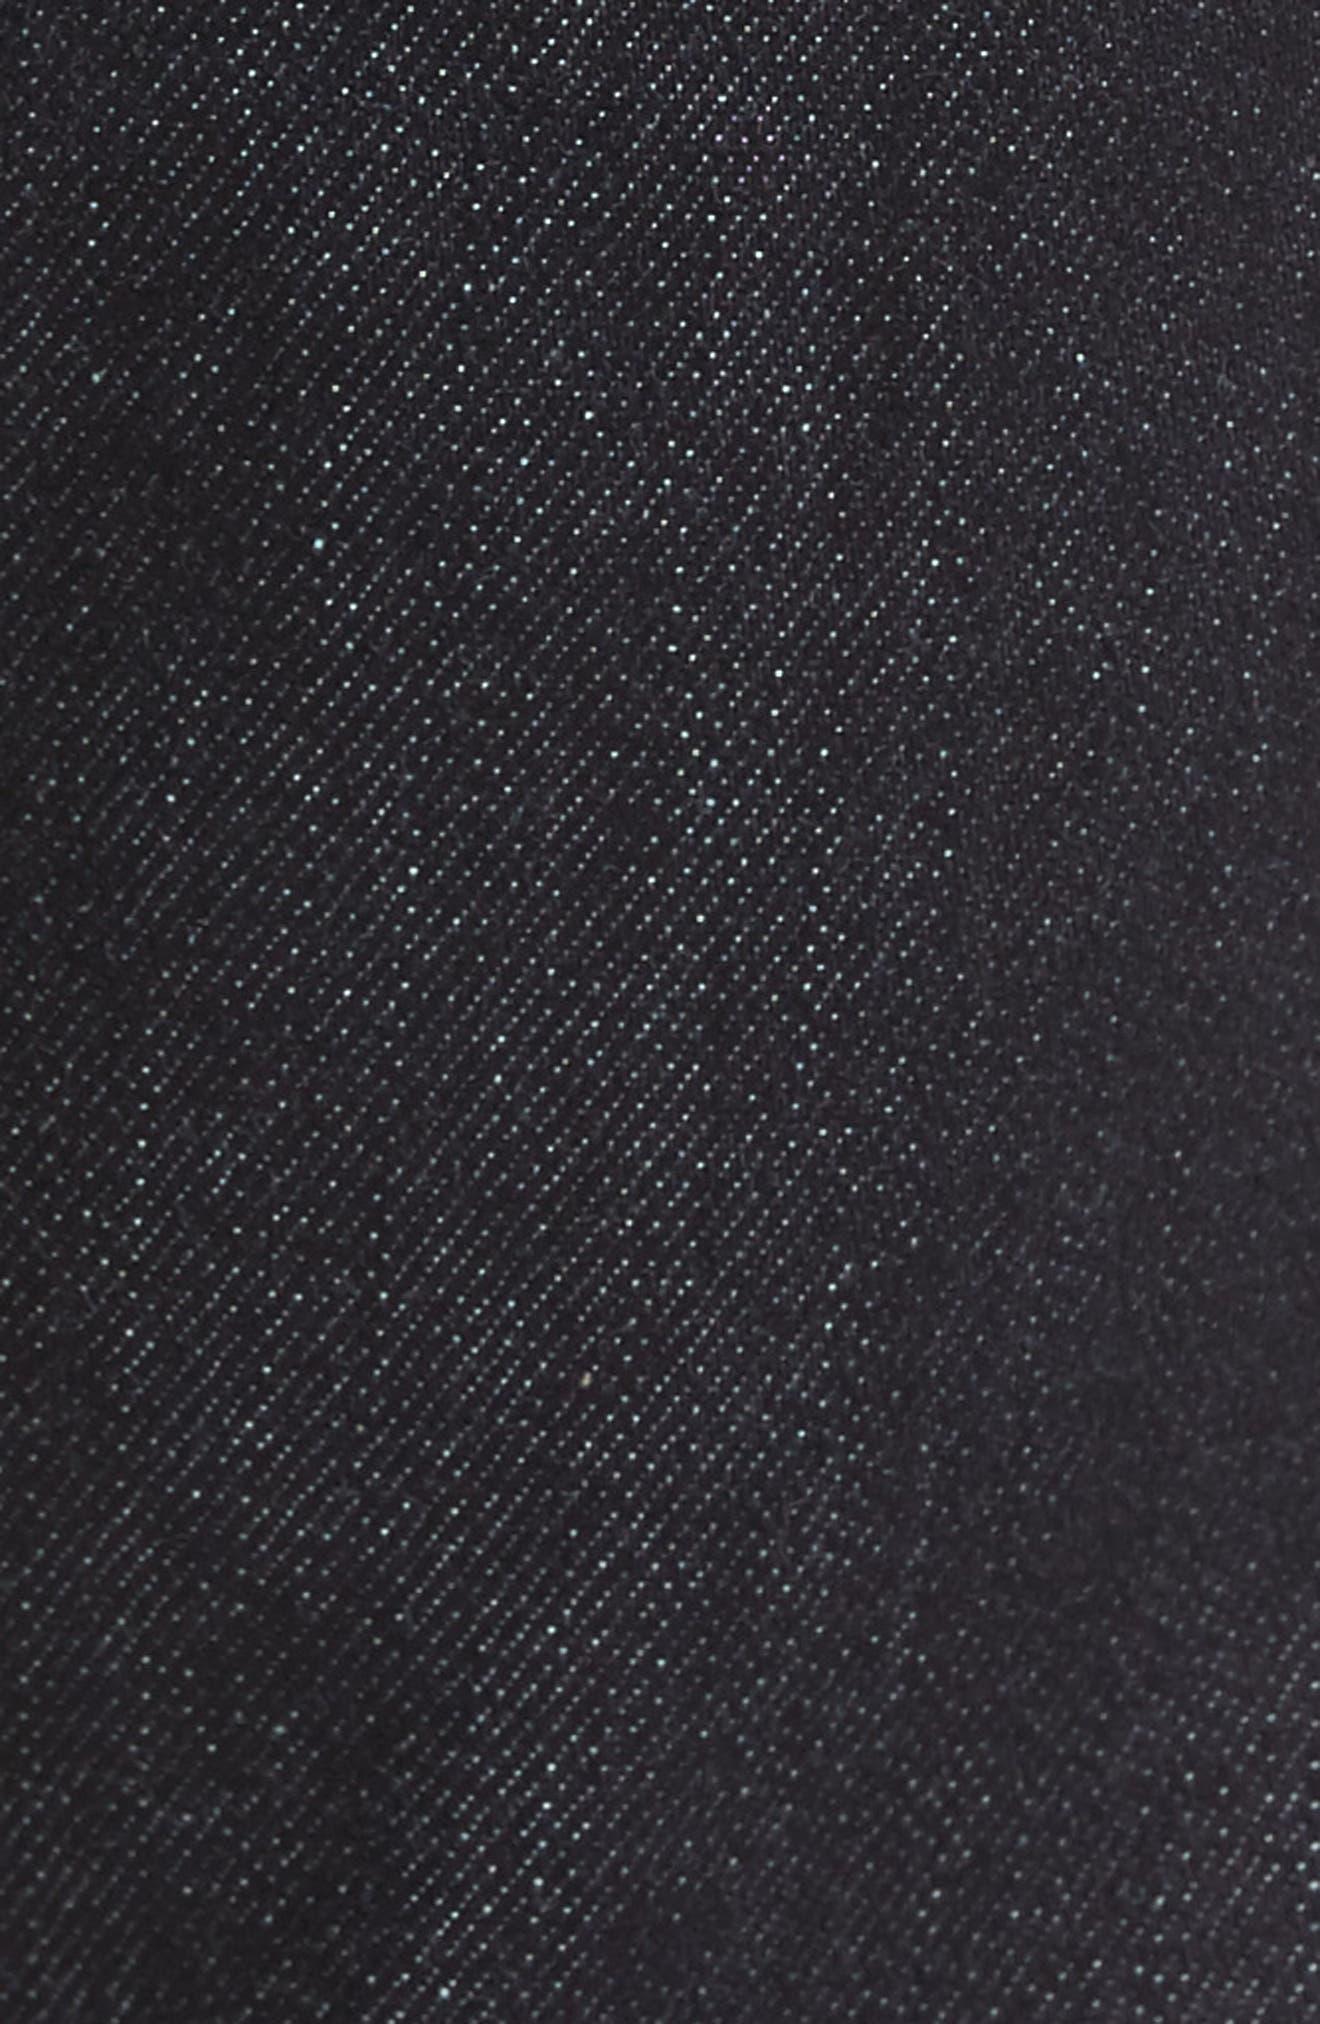 James Skinny Fit Jeans,                             Alternate thumbnail 5, color,                             Midnight Williamsburg